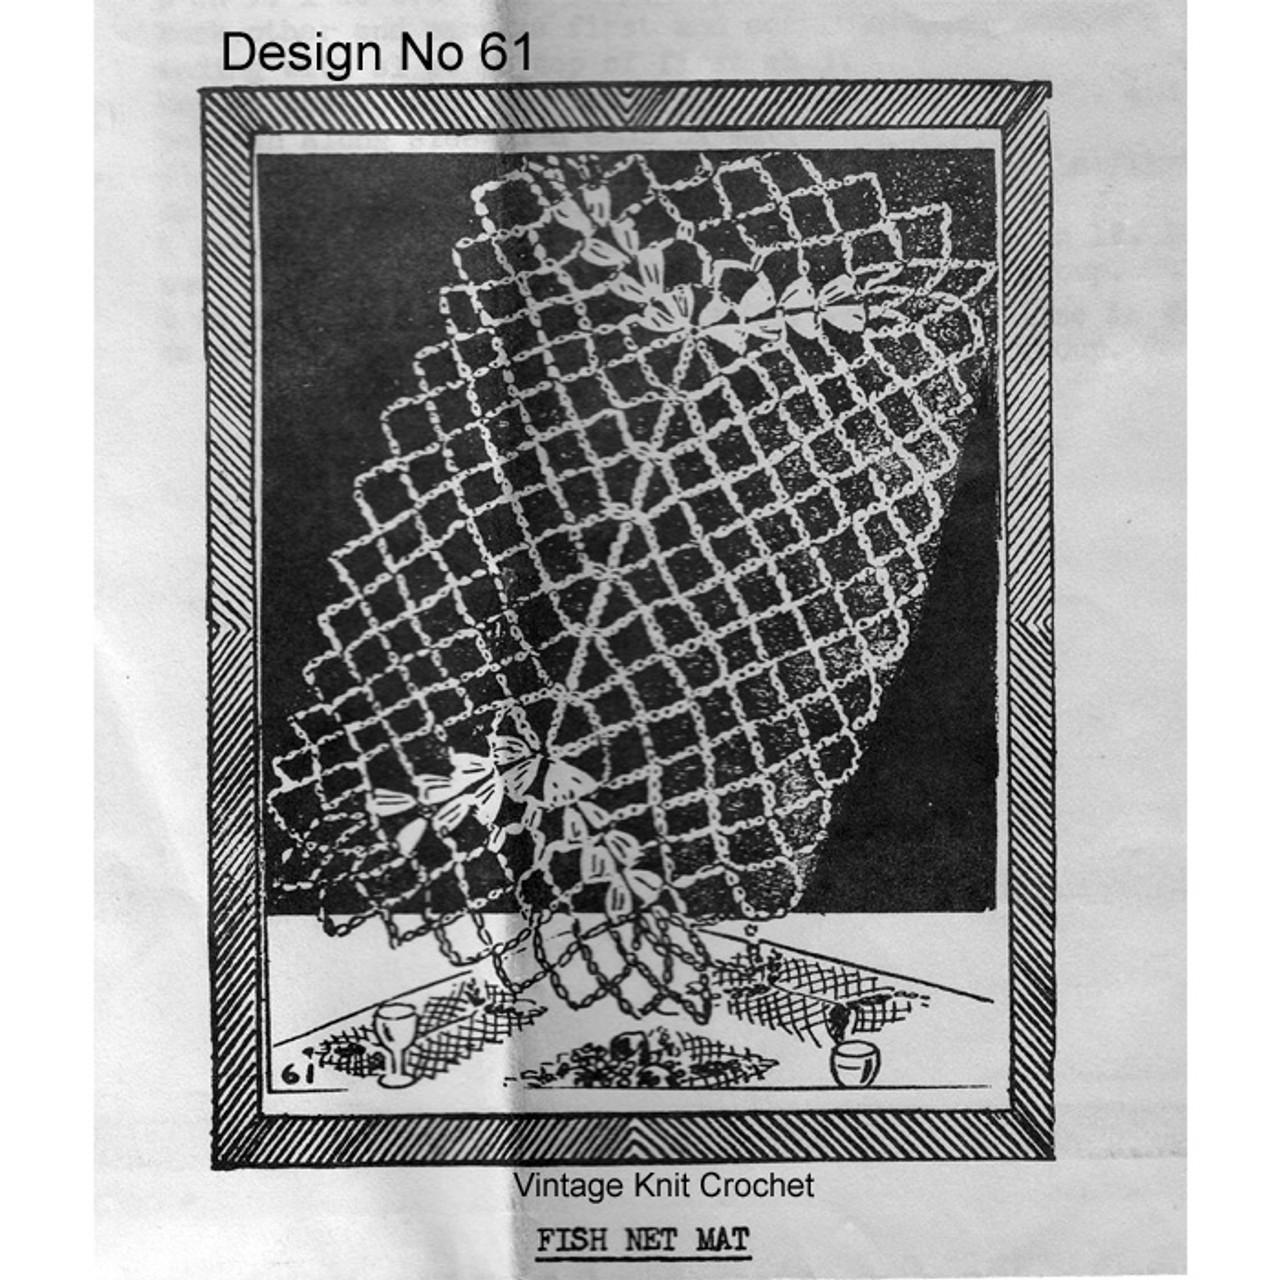 Needlework Bureau 61, Fish Net Mats Pattern